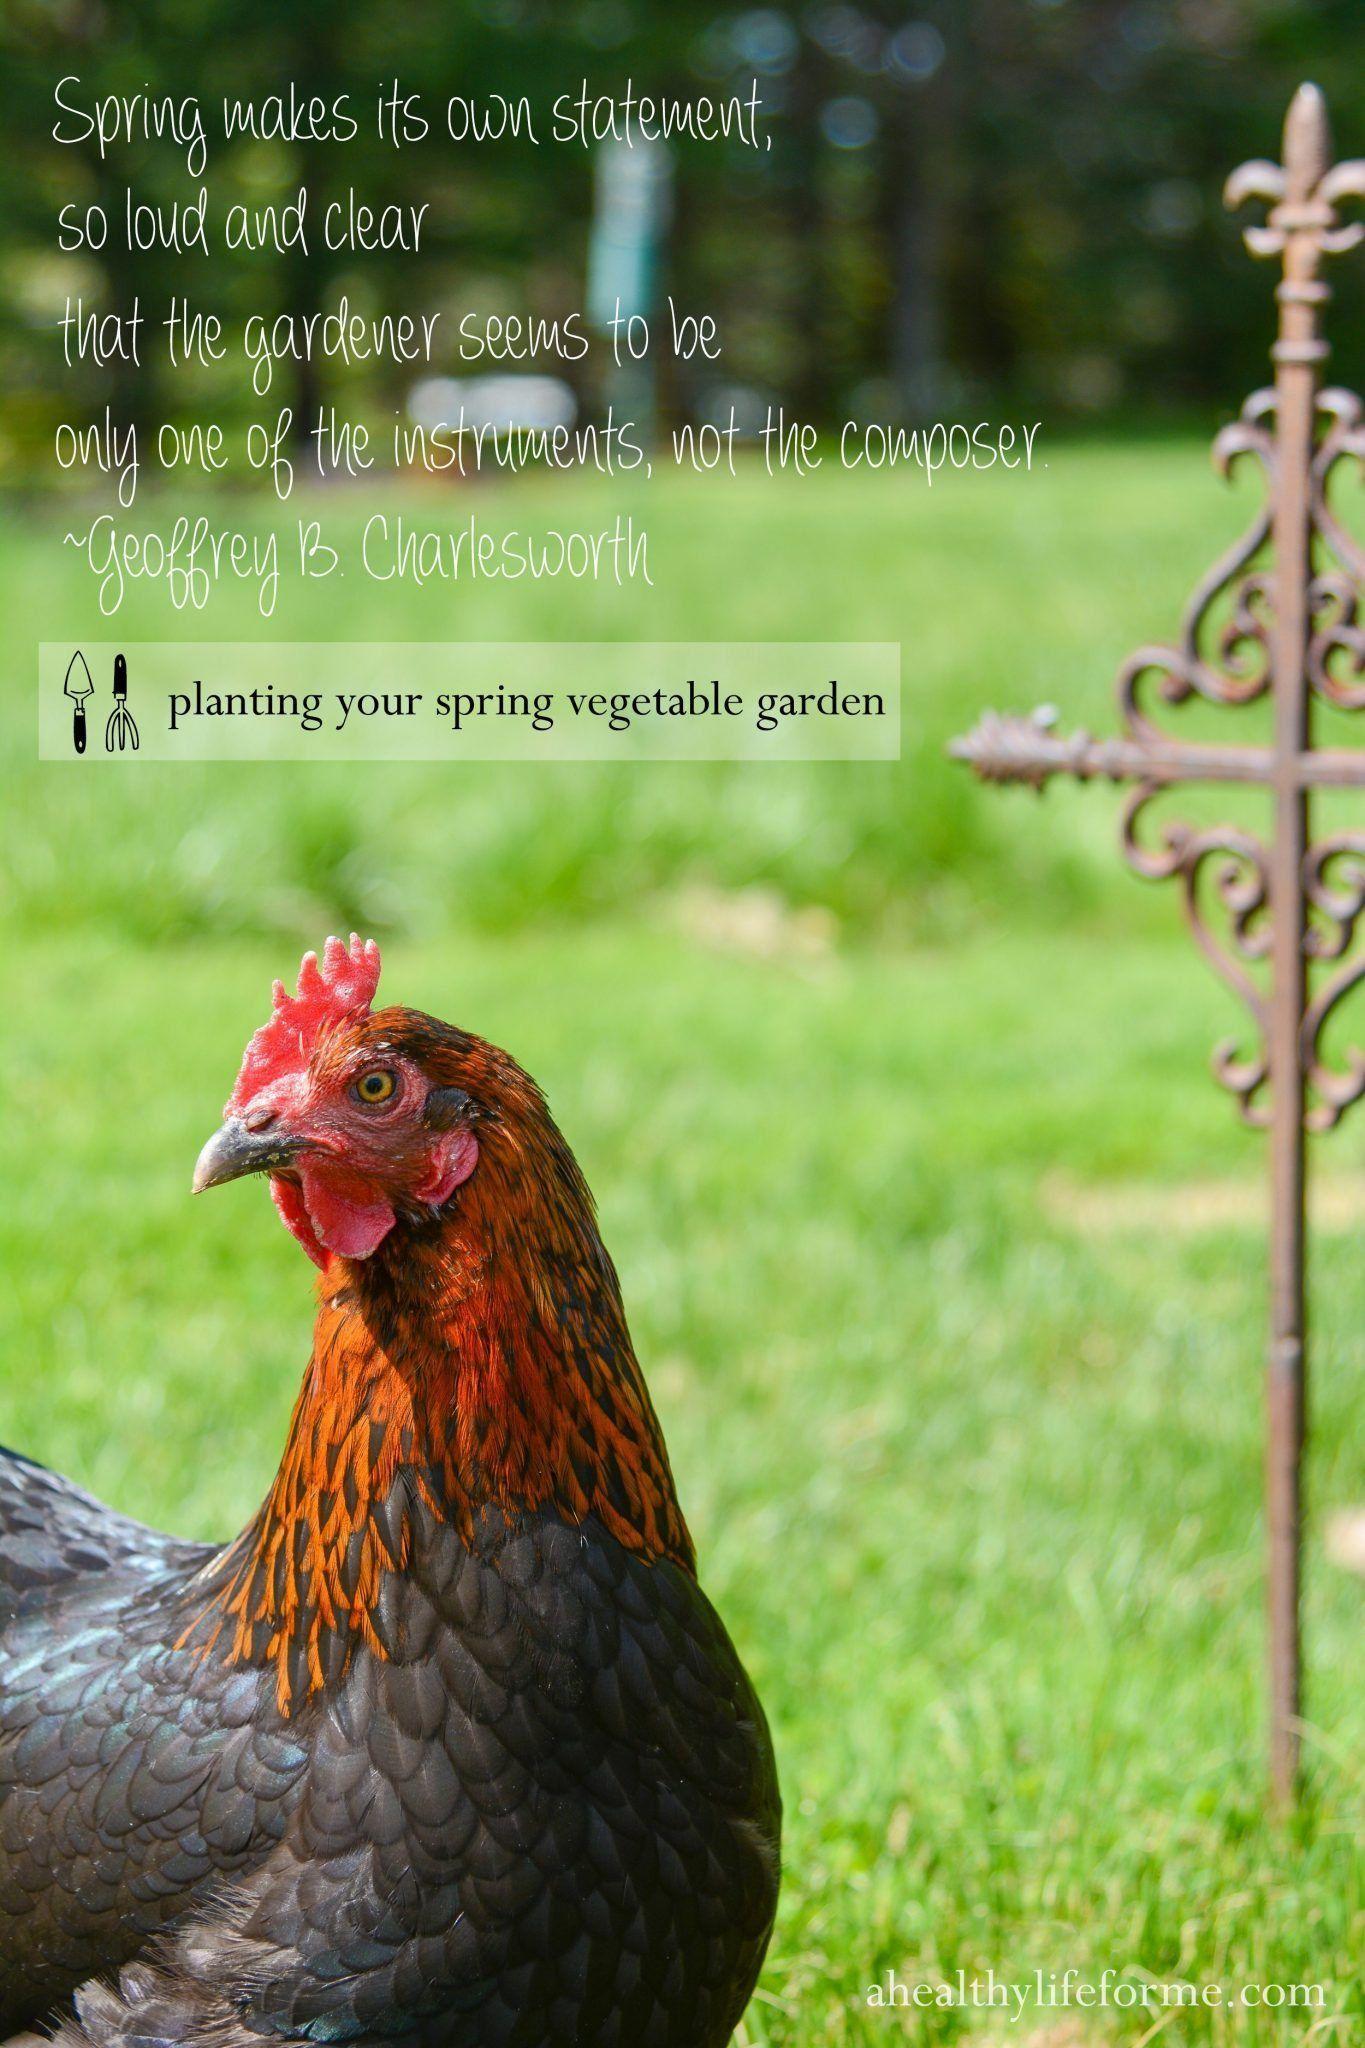 Planting Your Spring Vegetable Garden - A Healthy Life For Me,  #garden #Healthy #Life #Planting #Spring #vegetable